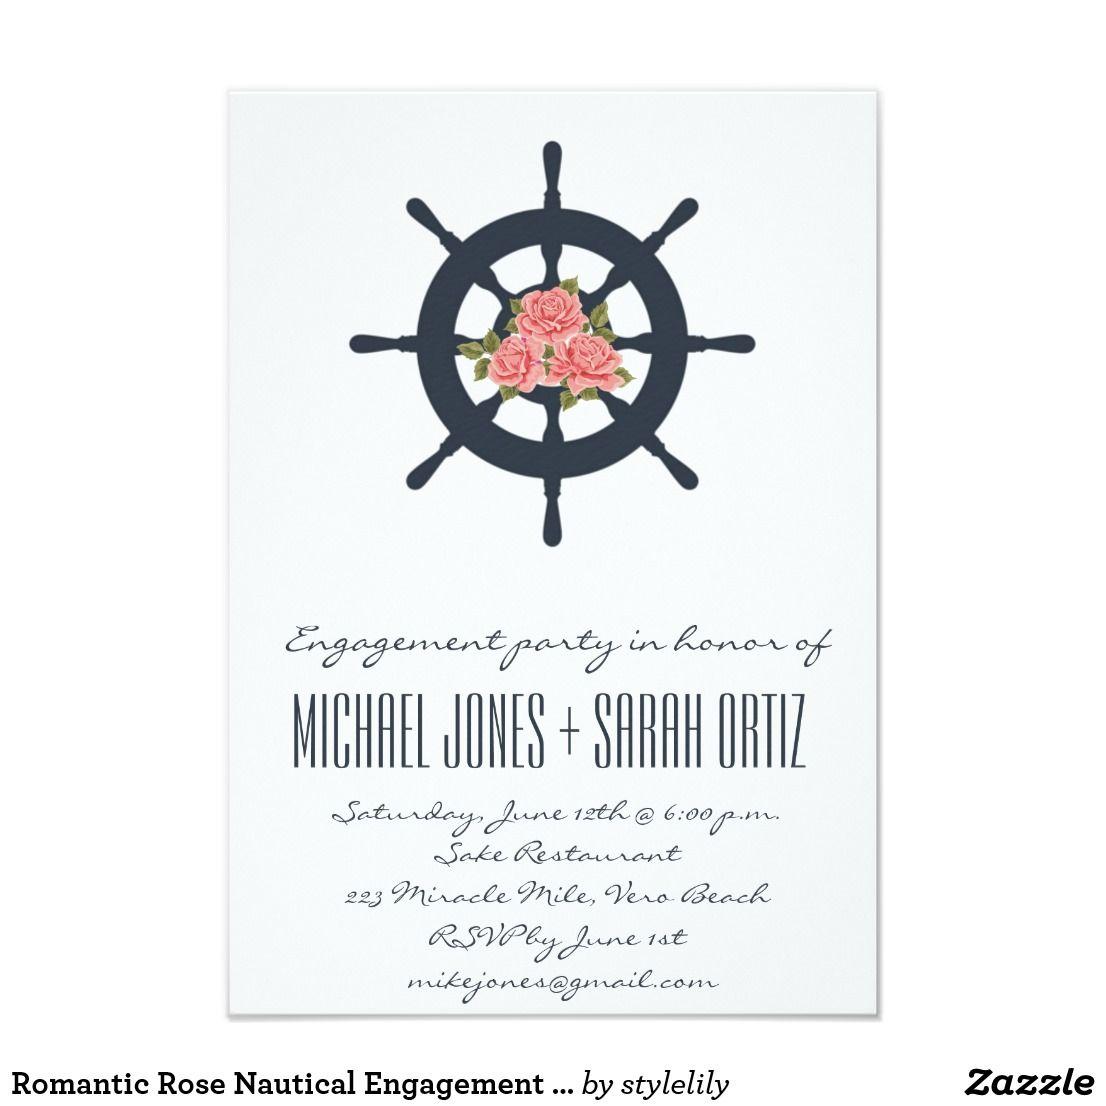 Romantic Rose Nautical Engagement Party Invitation Navy blue ...